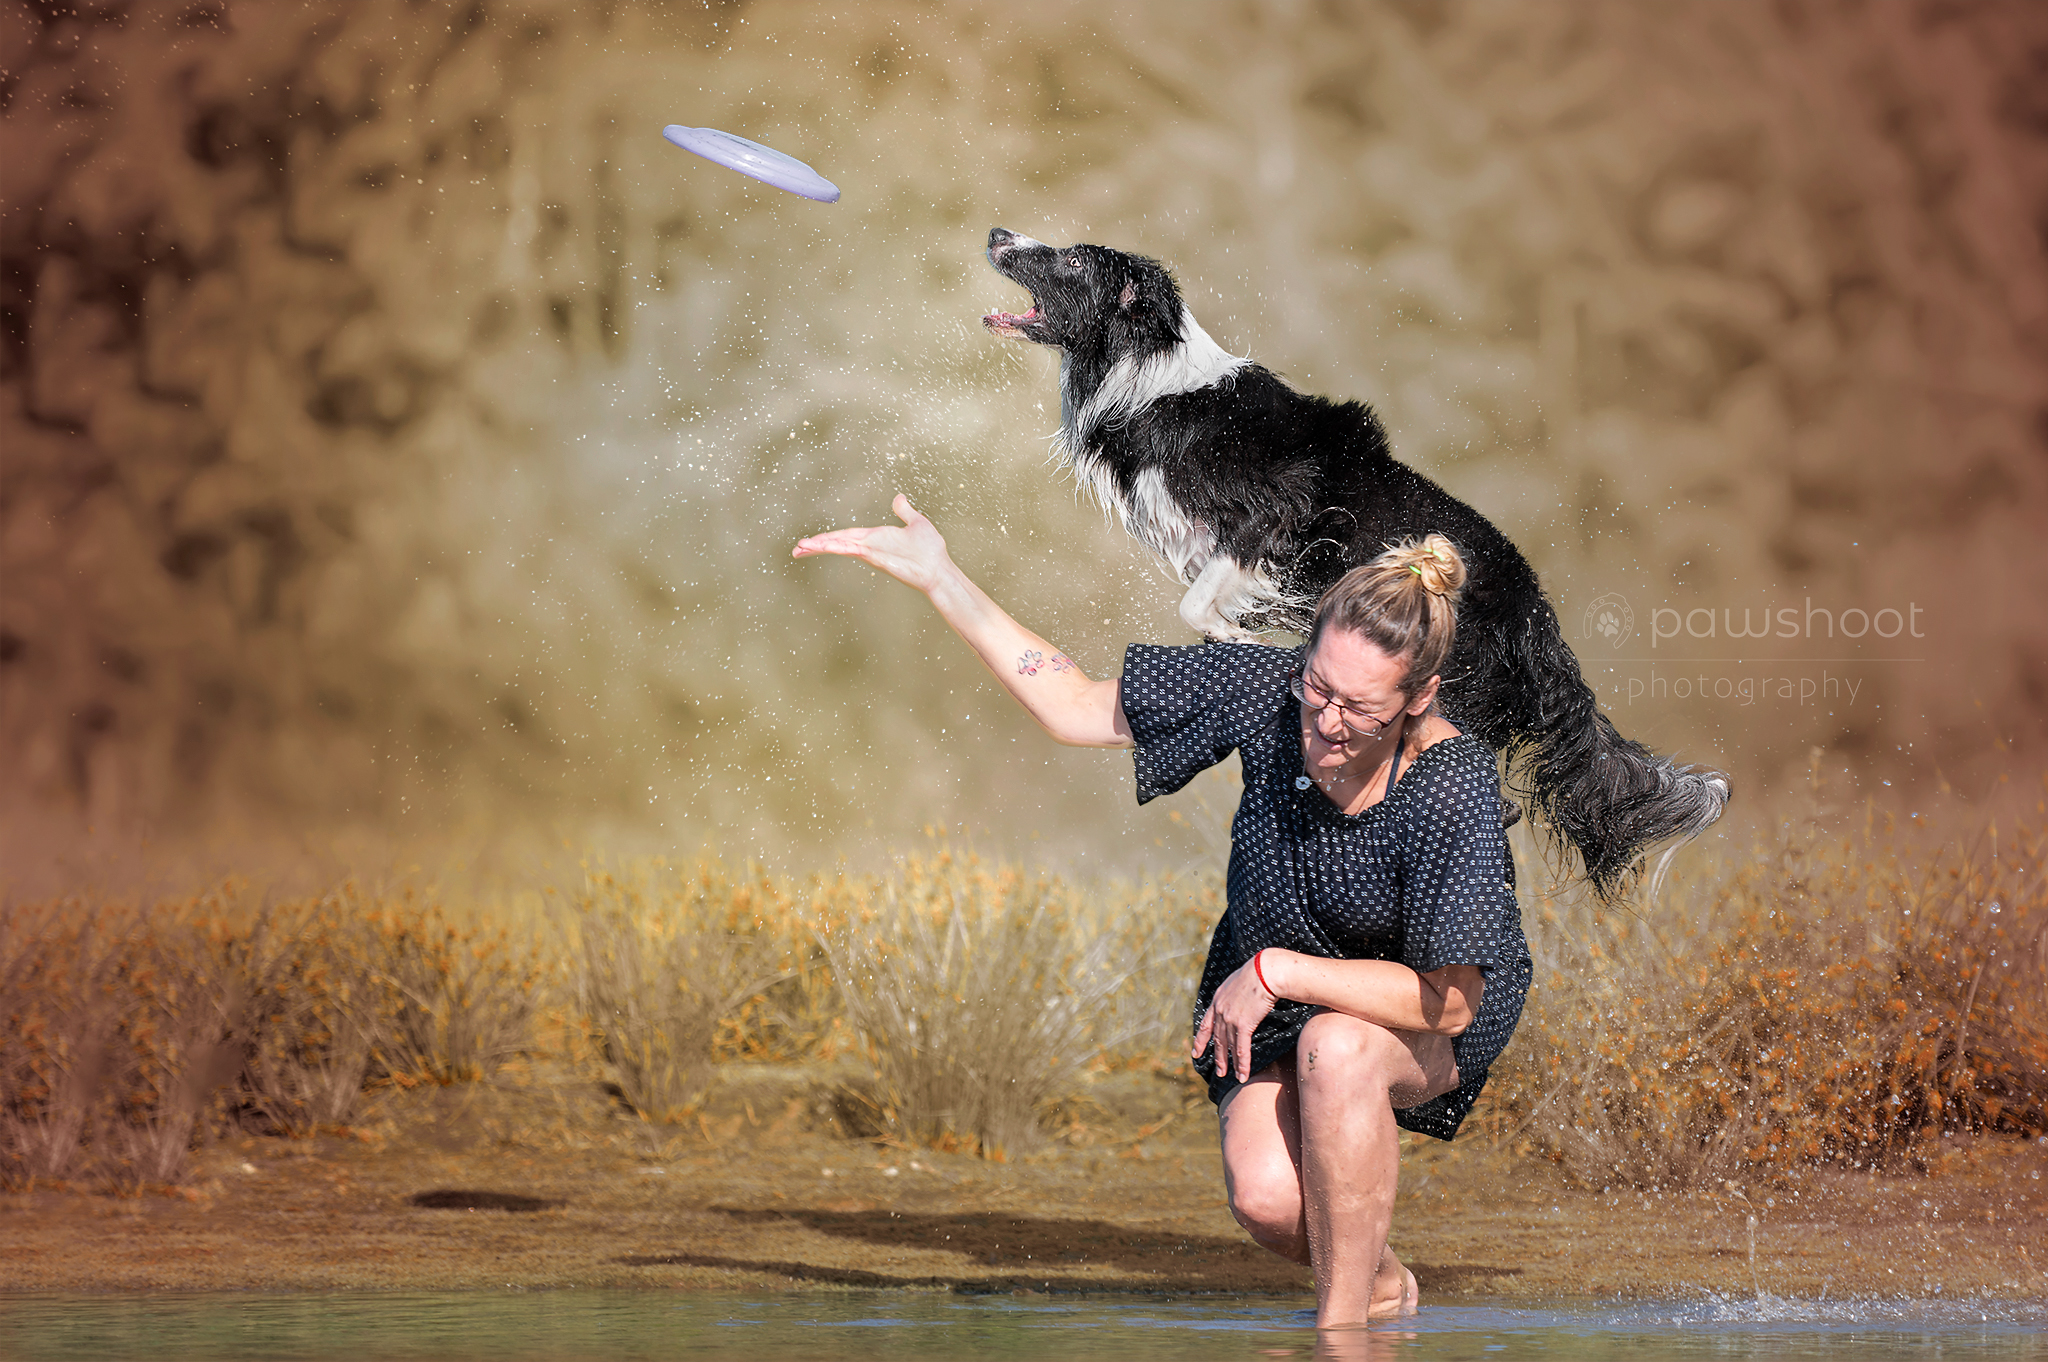 springende hond frisbee Pawshoot hondenfotografie